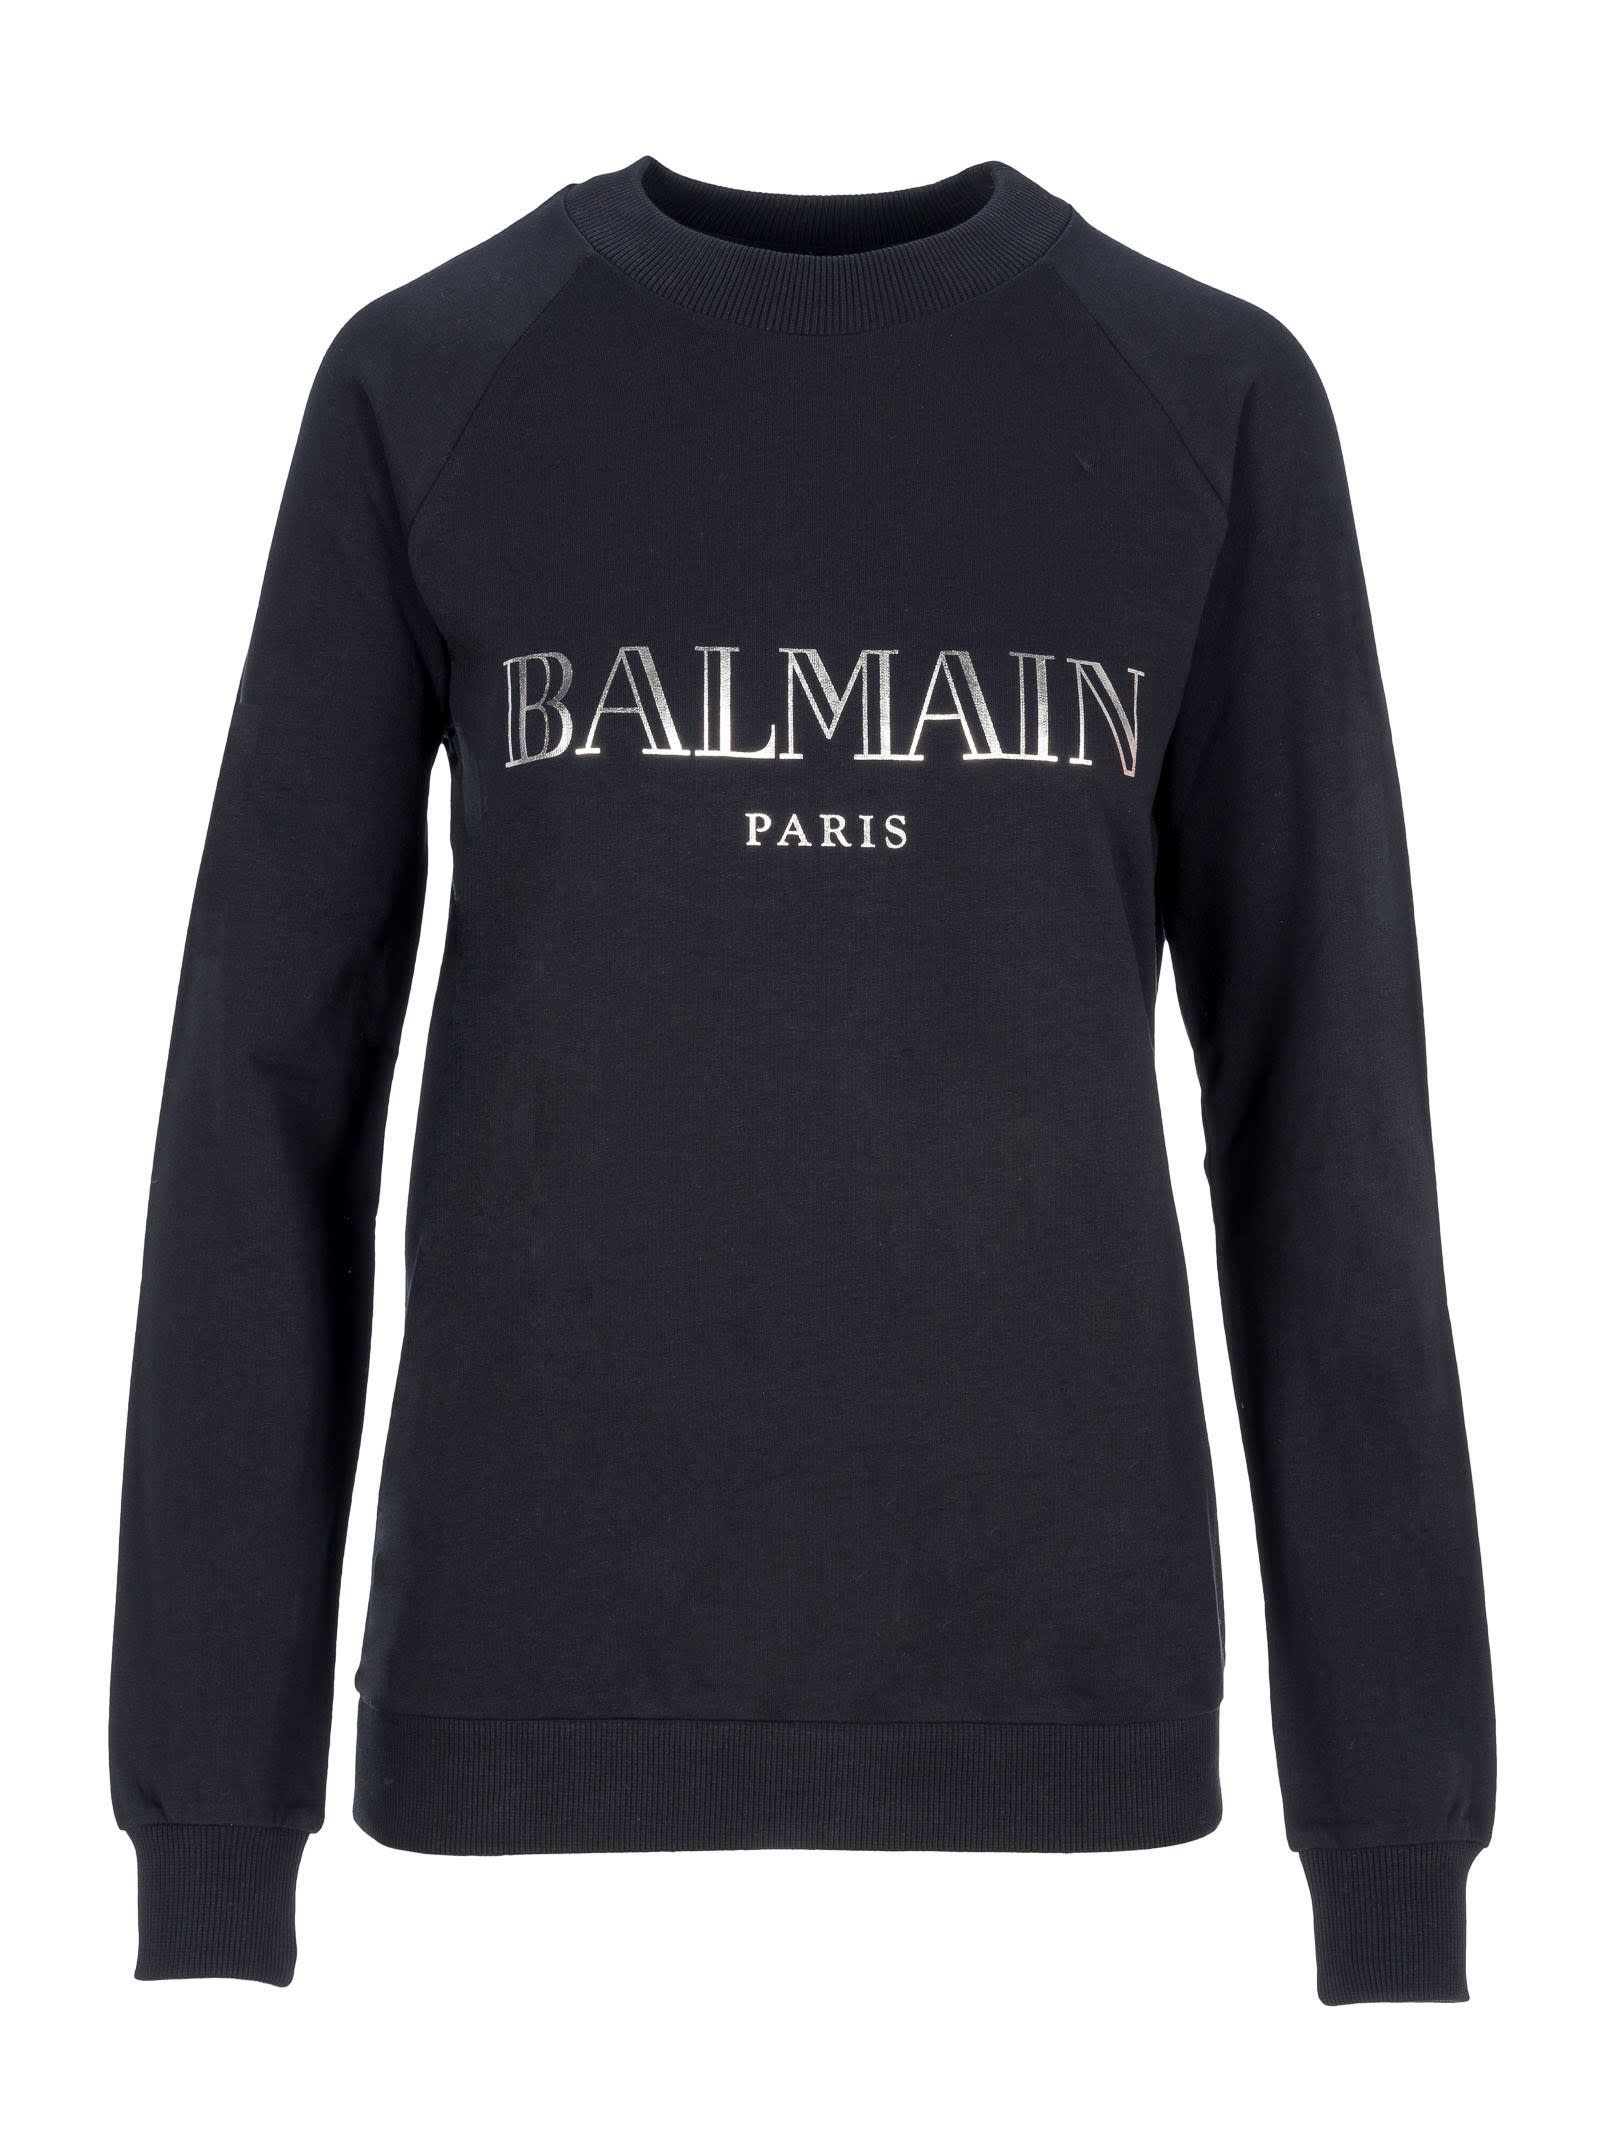 Balmain Shirts LOGO PRINT SWEATSHIRT